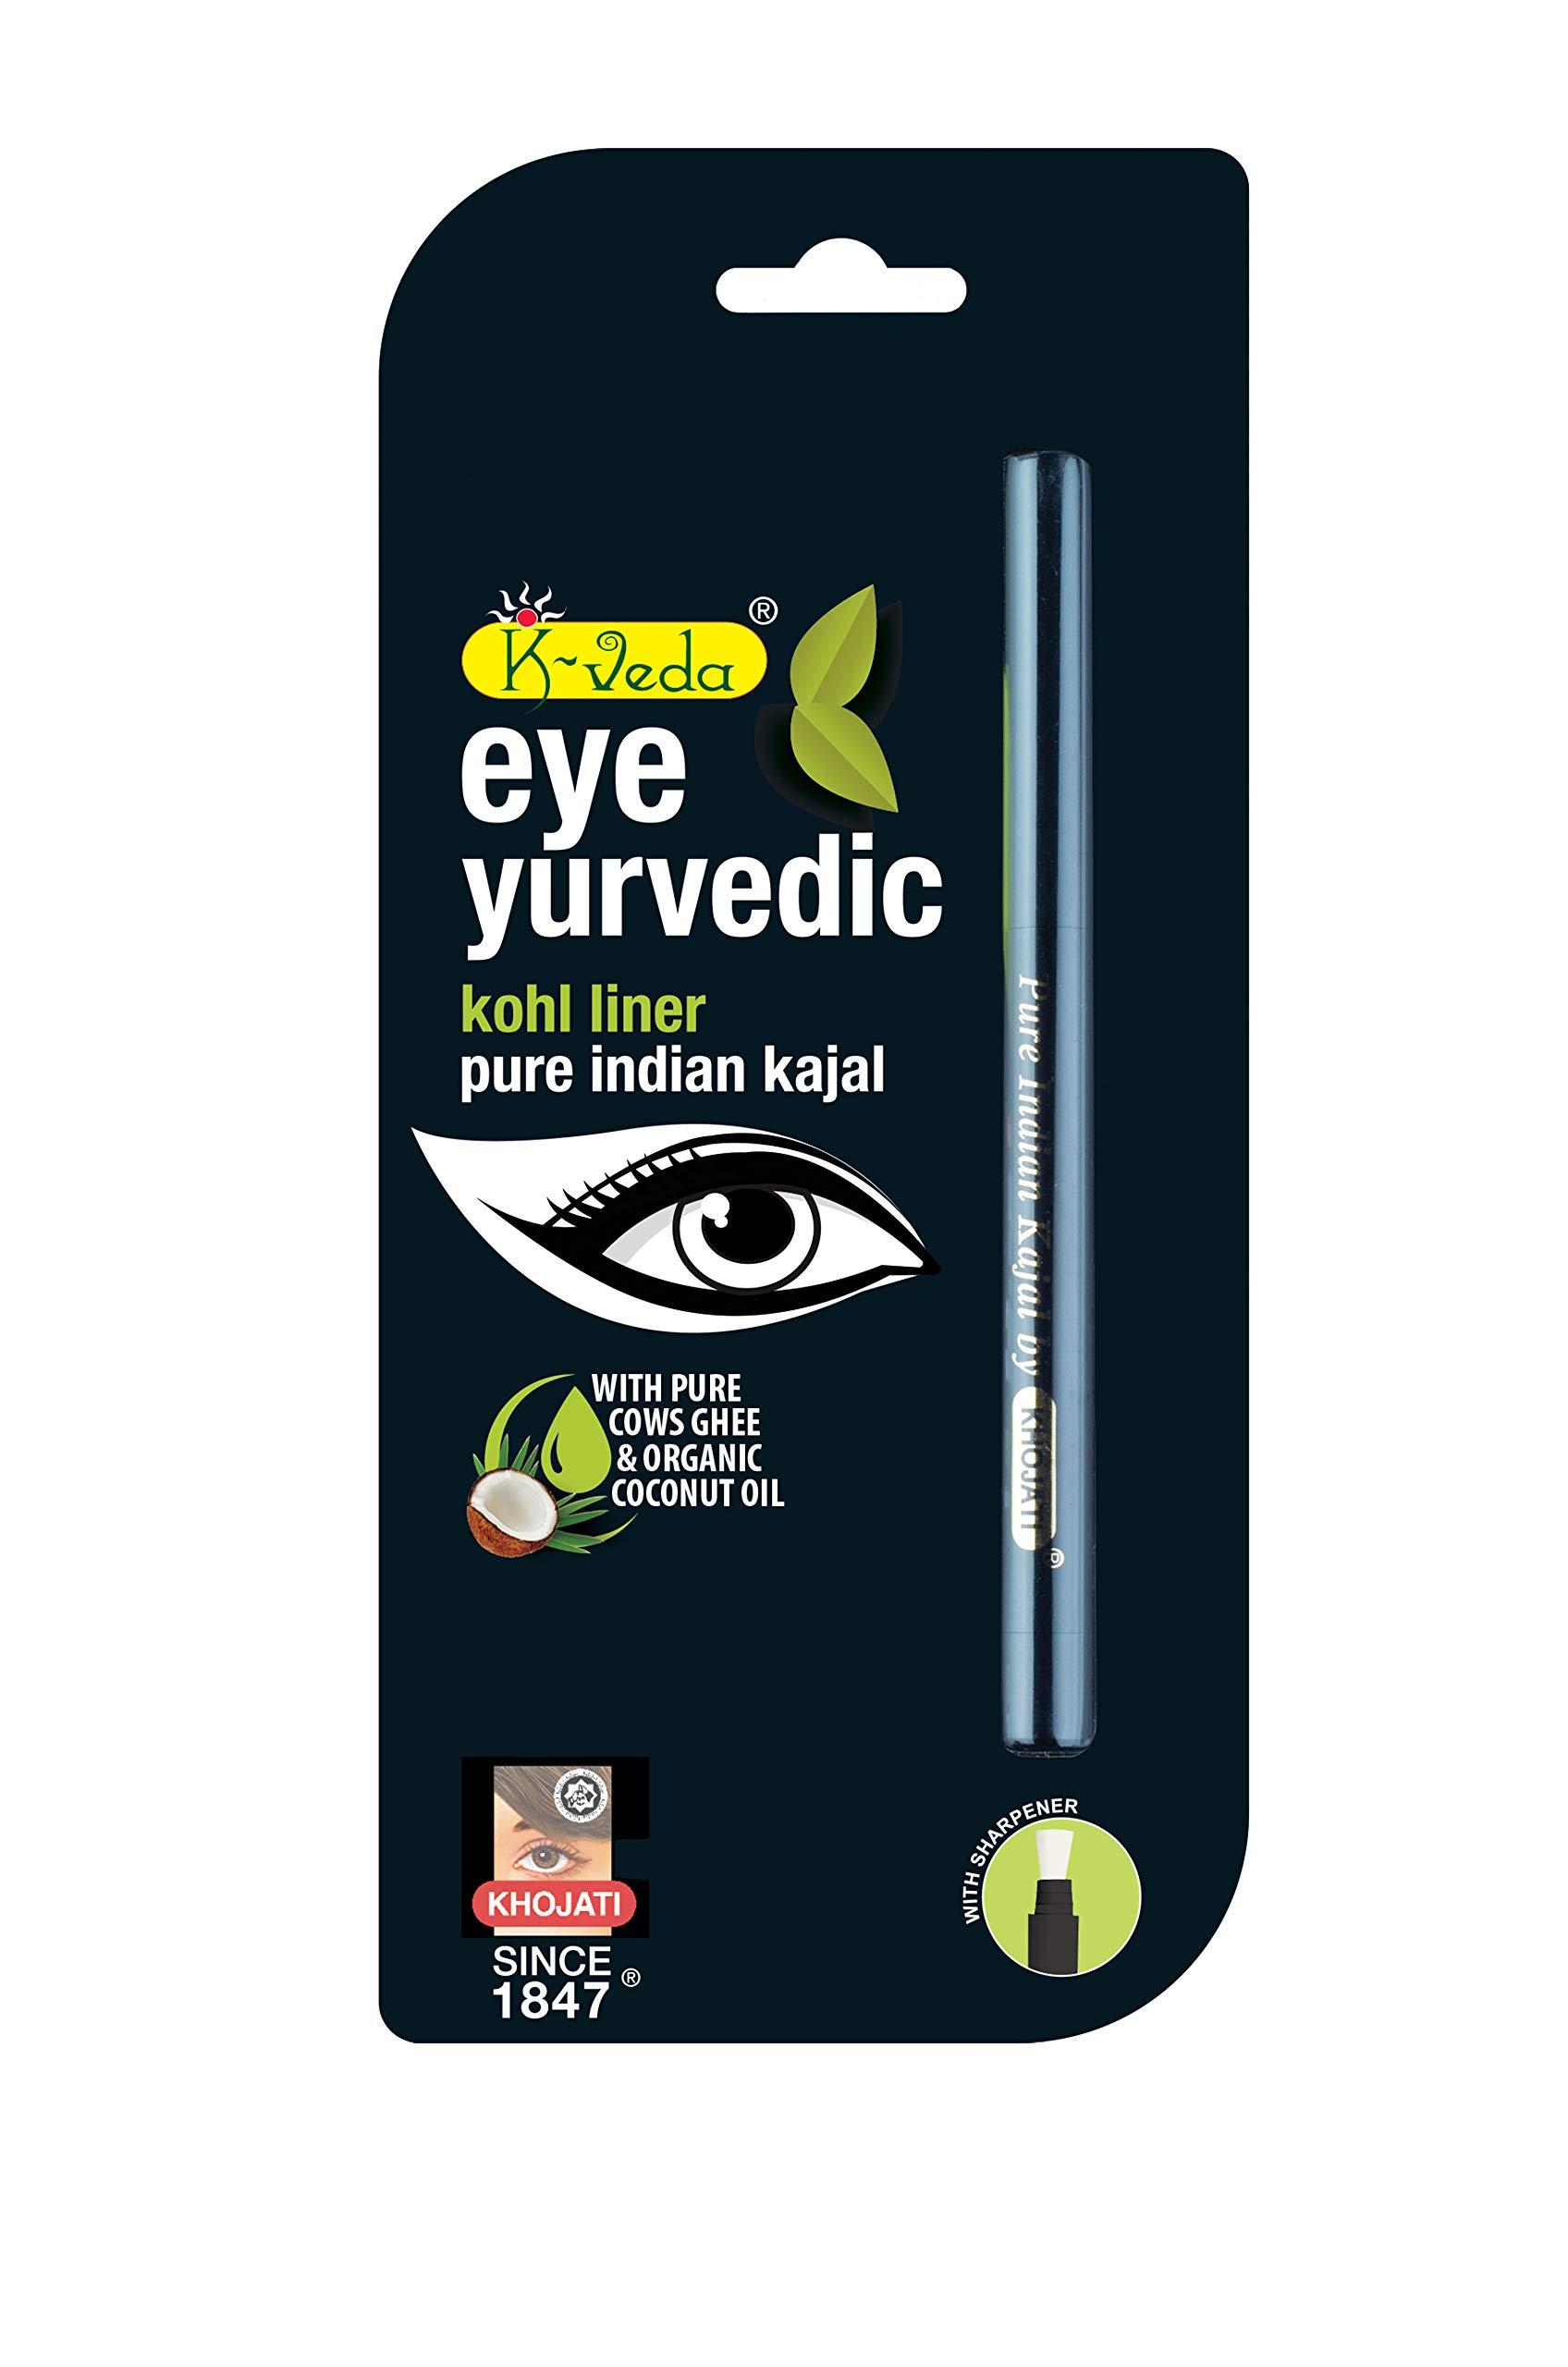 K-Veda Eyeurvedic Kohl Liner (Black) product image